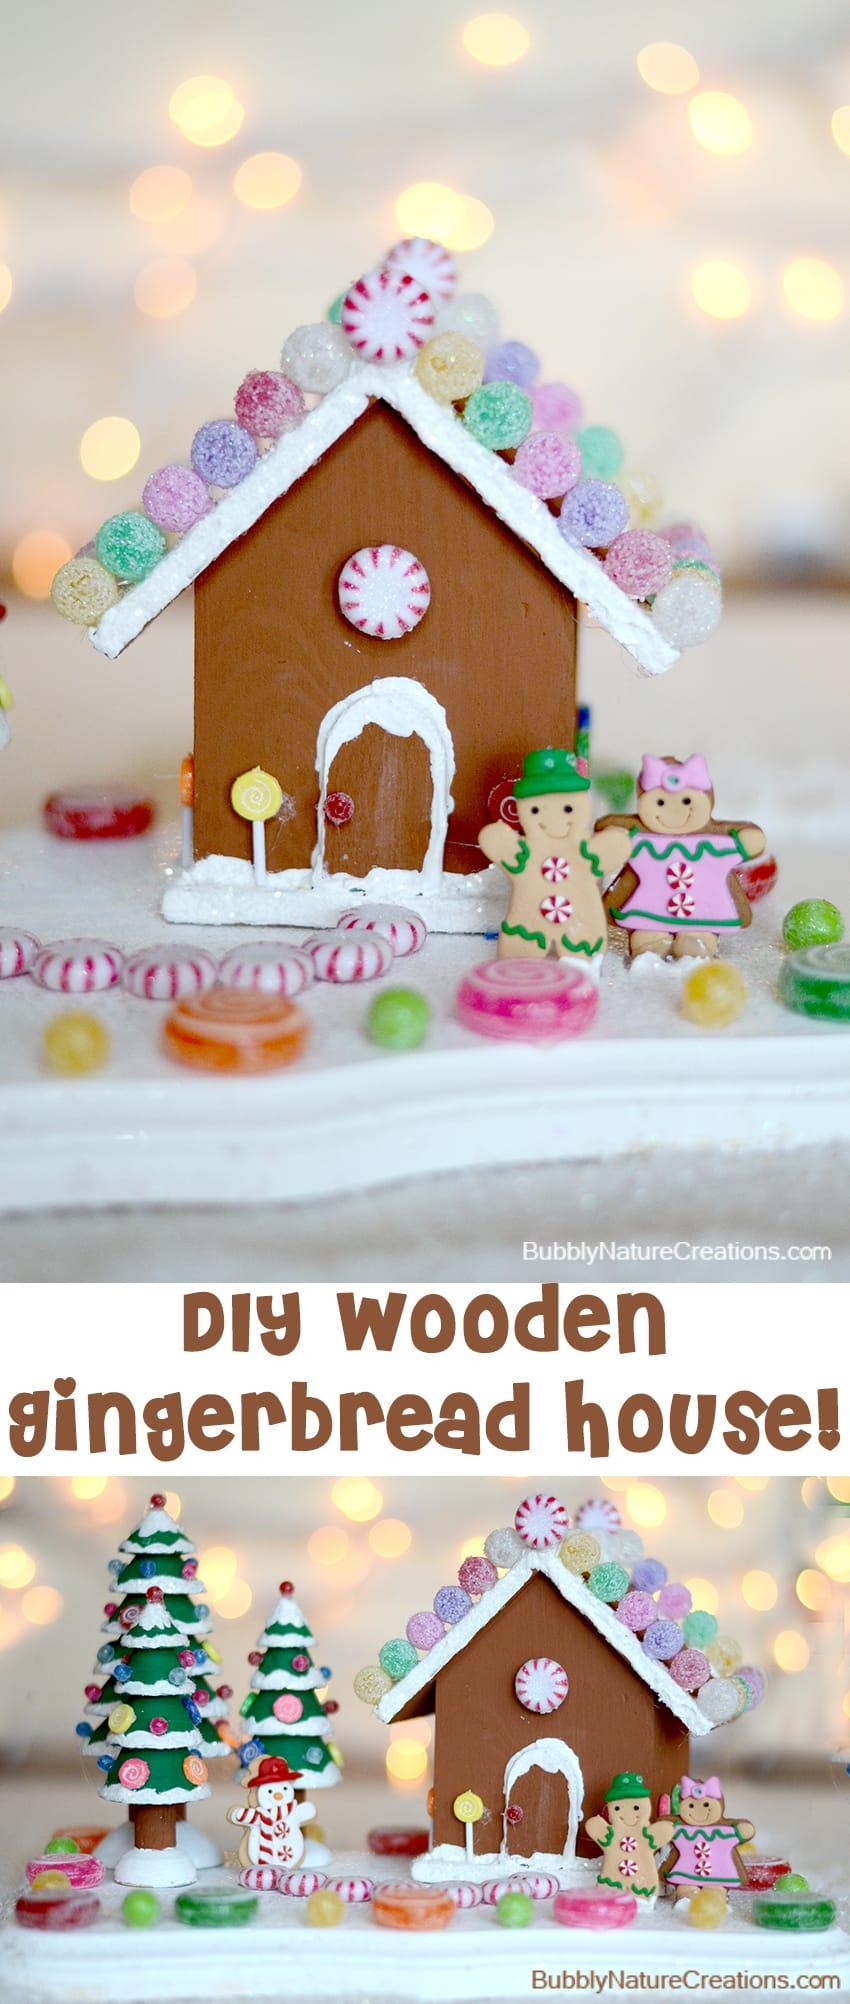 diy wooden gingerbread house